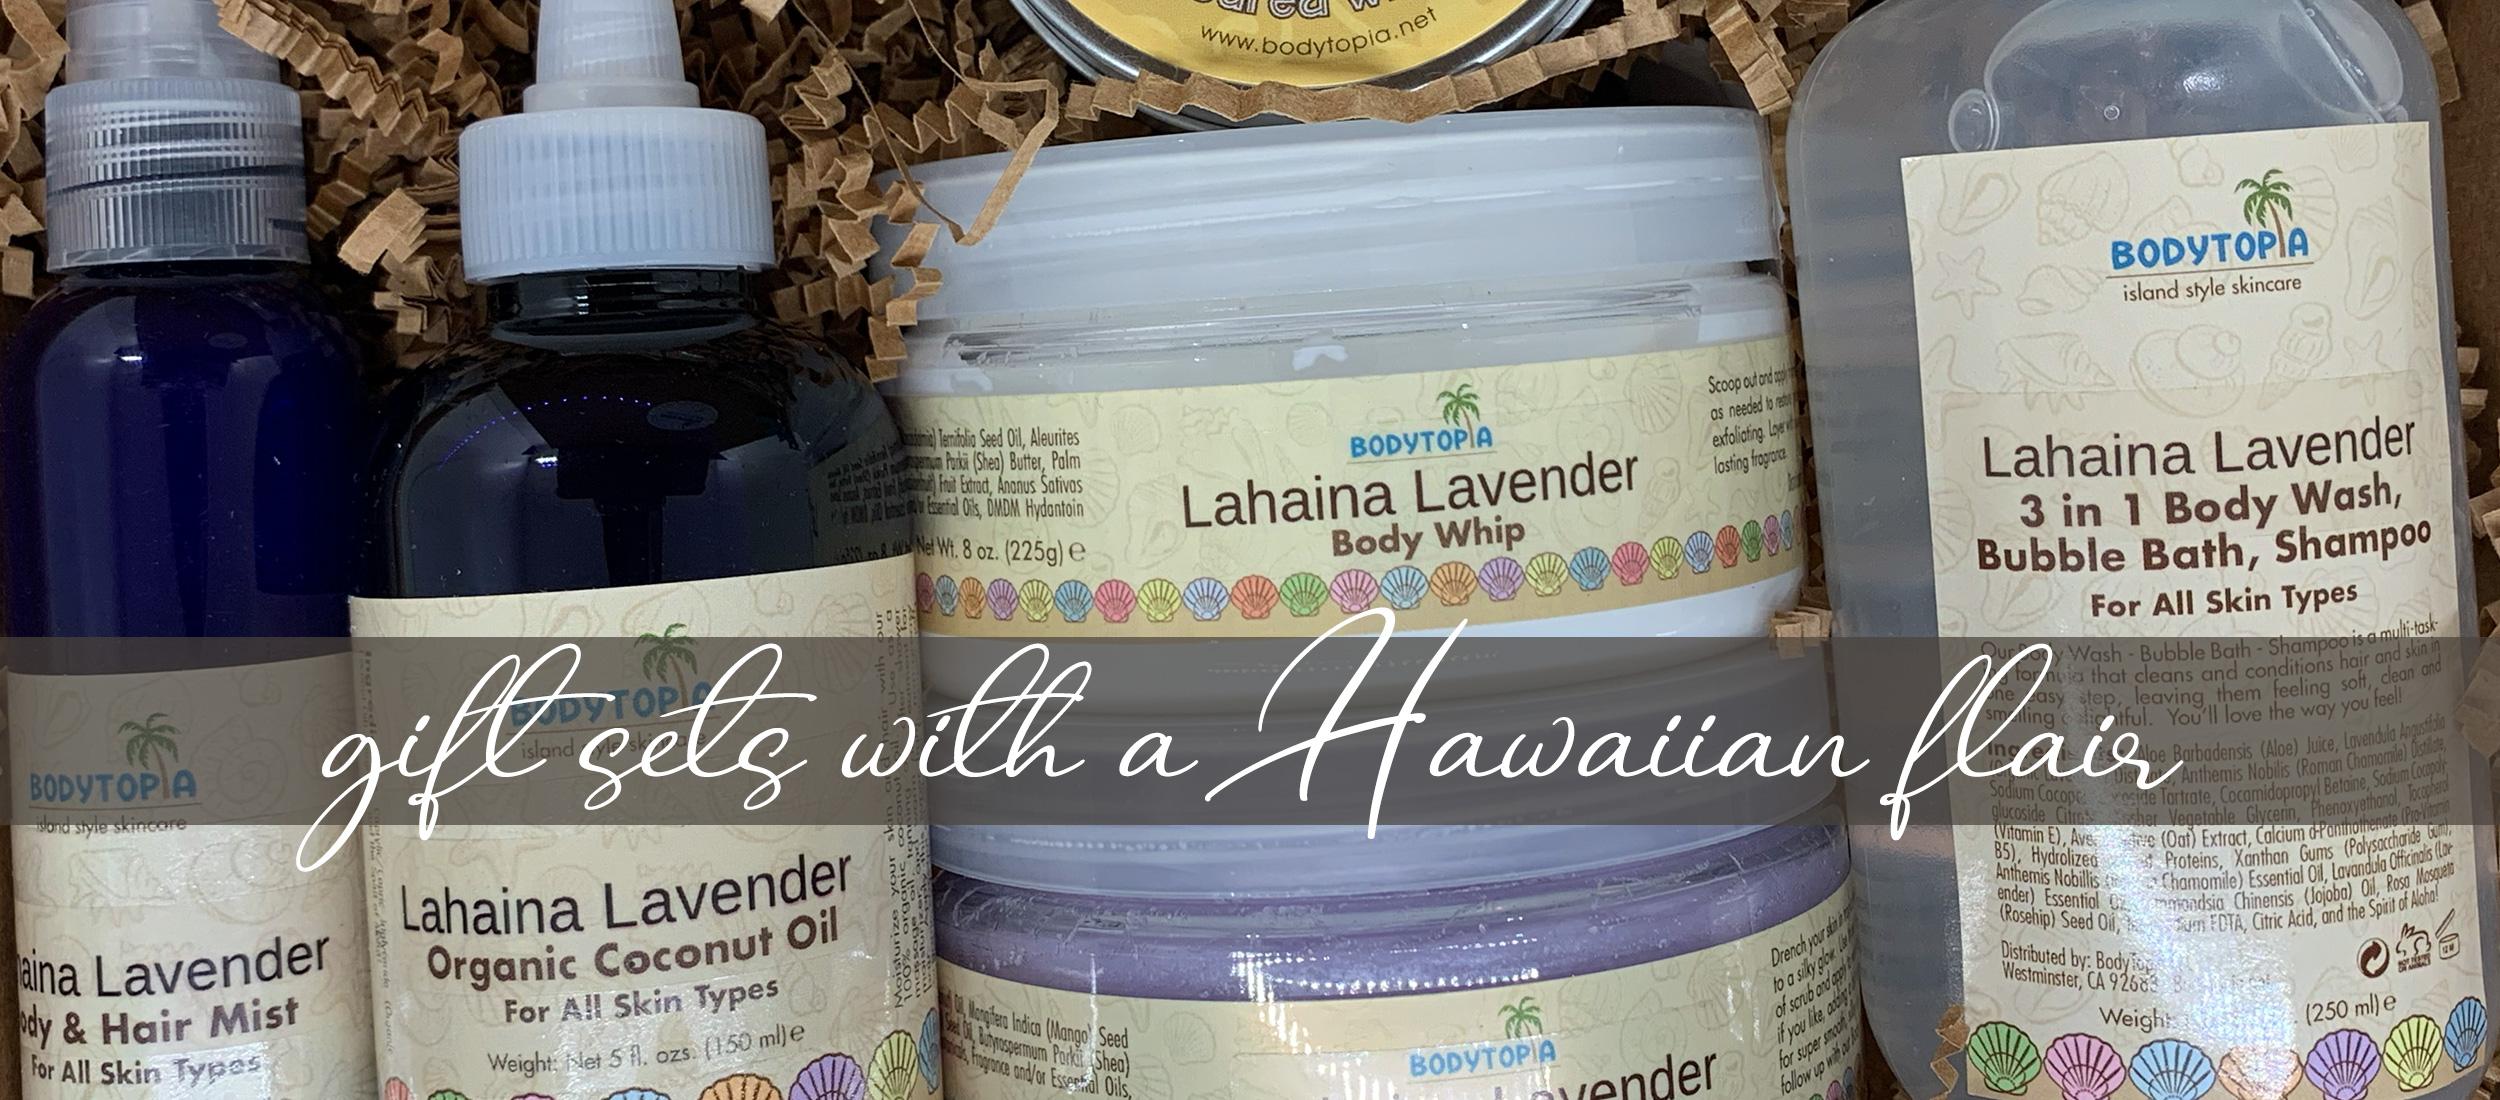 Gift sets with a Hawaiian flair